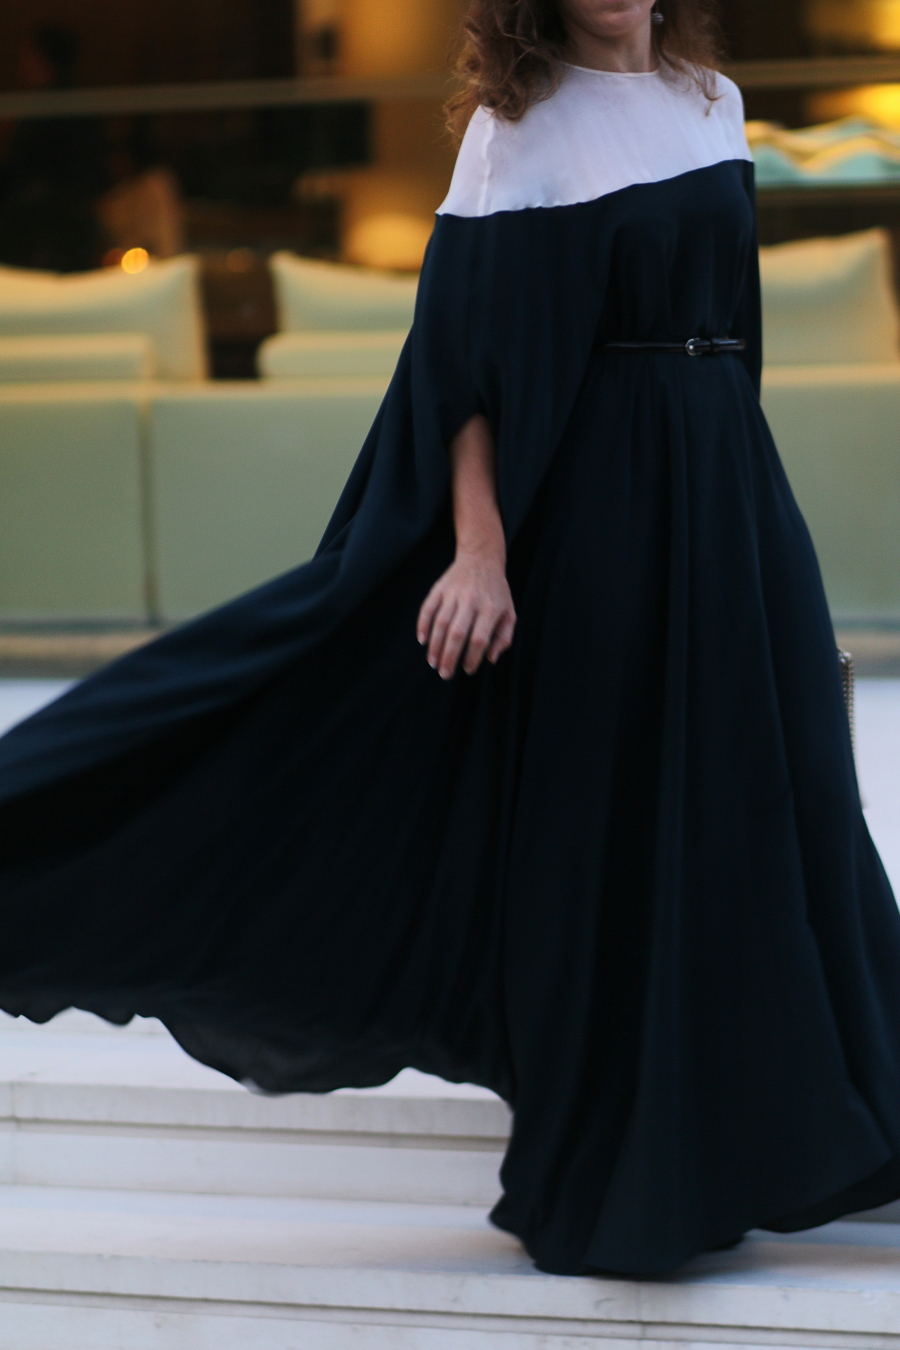 stellina italian fashion stories haze unsigned cape dress giuseppe zanotti sandals